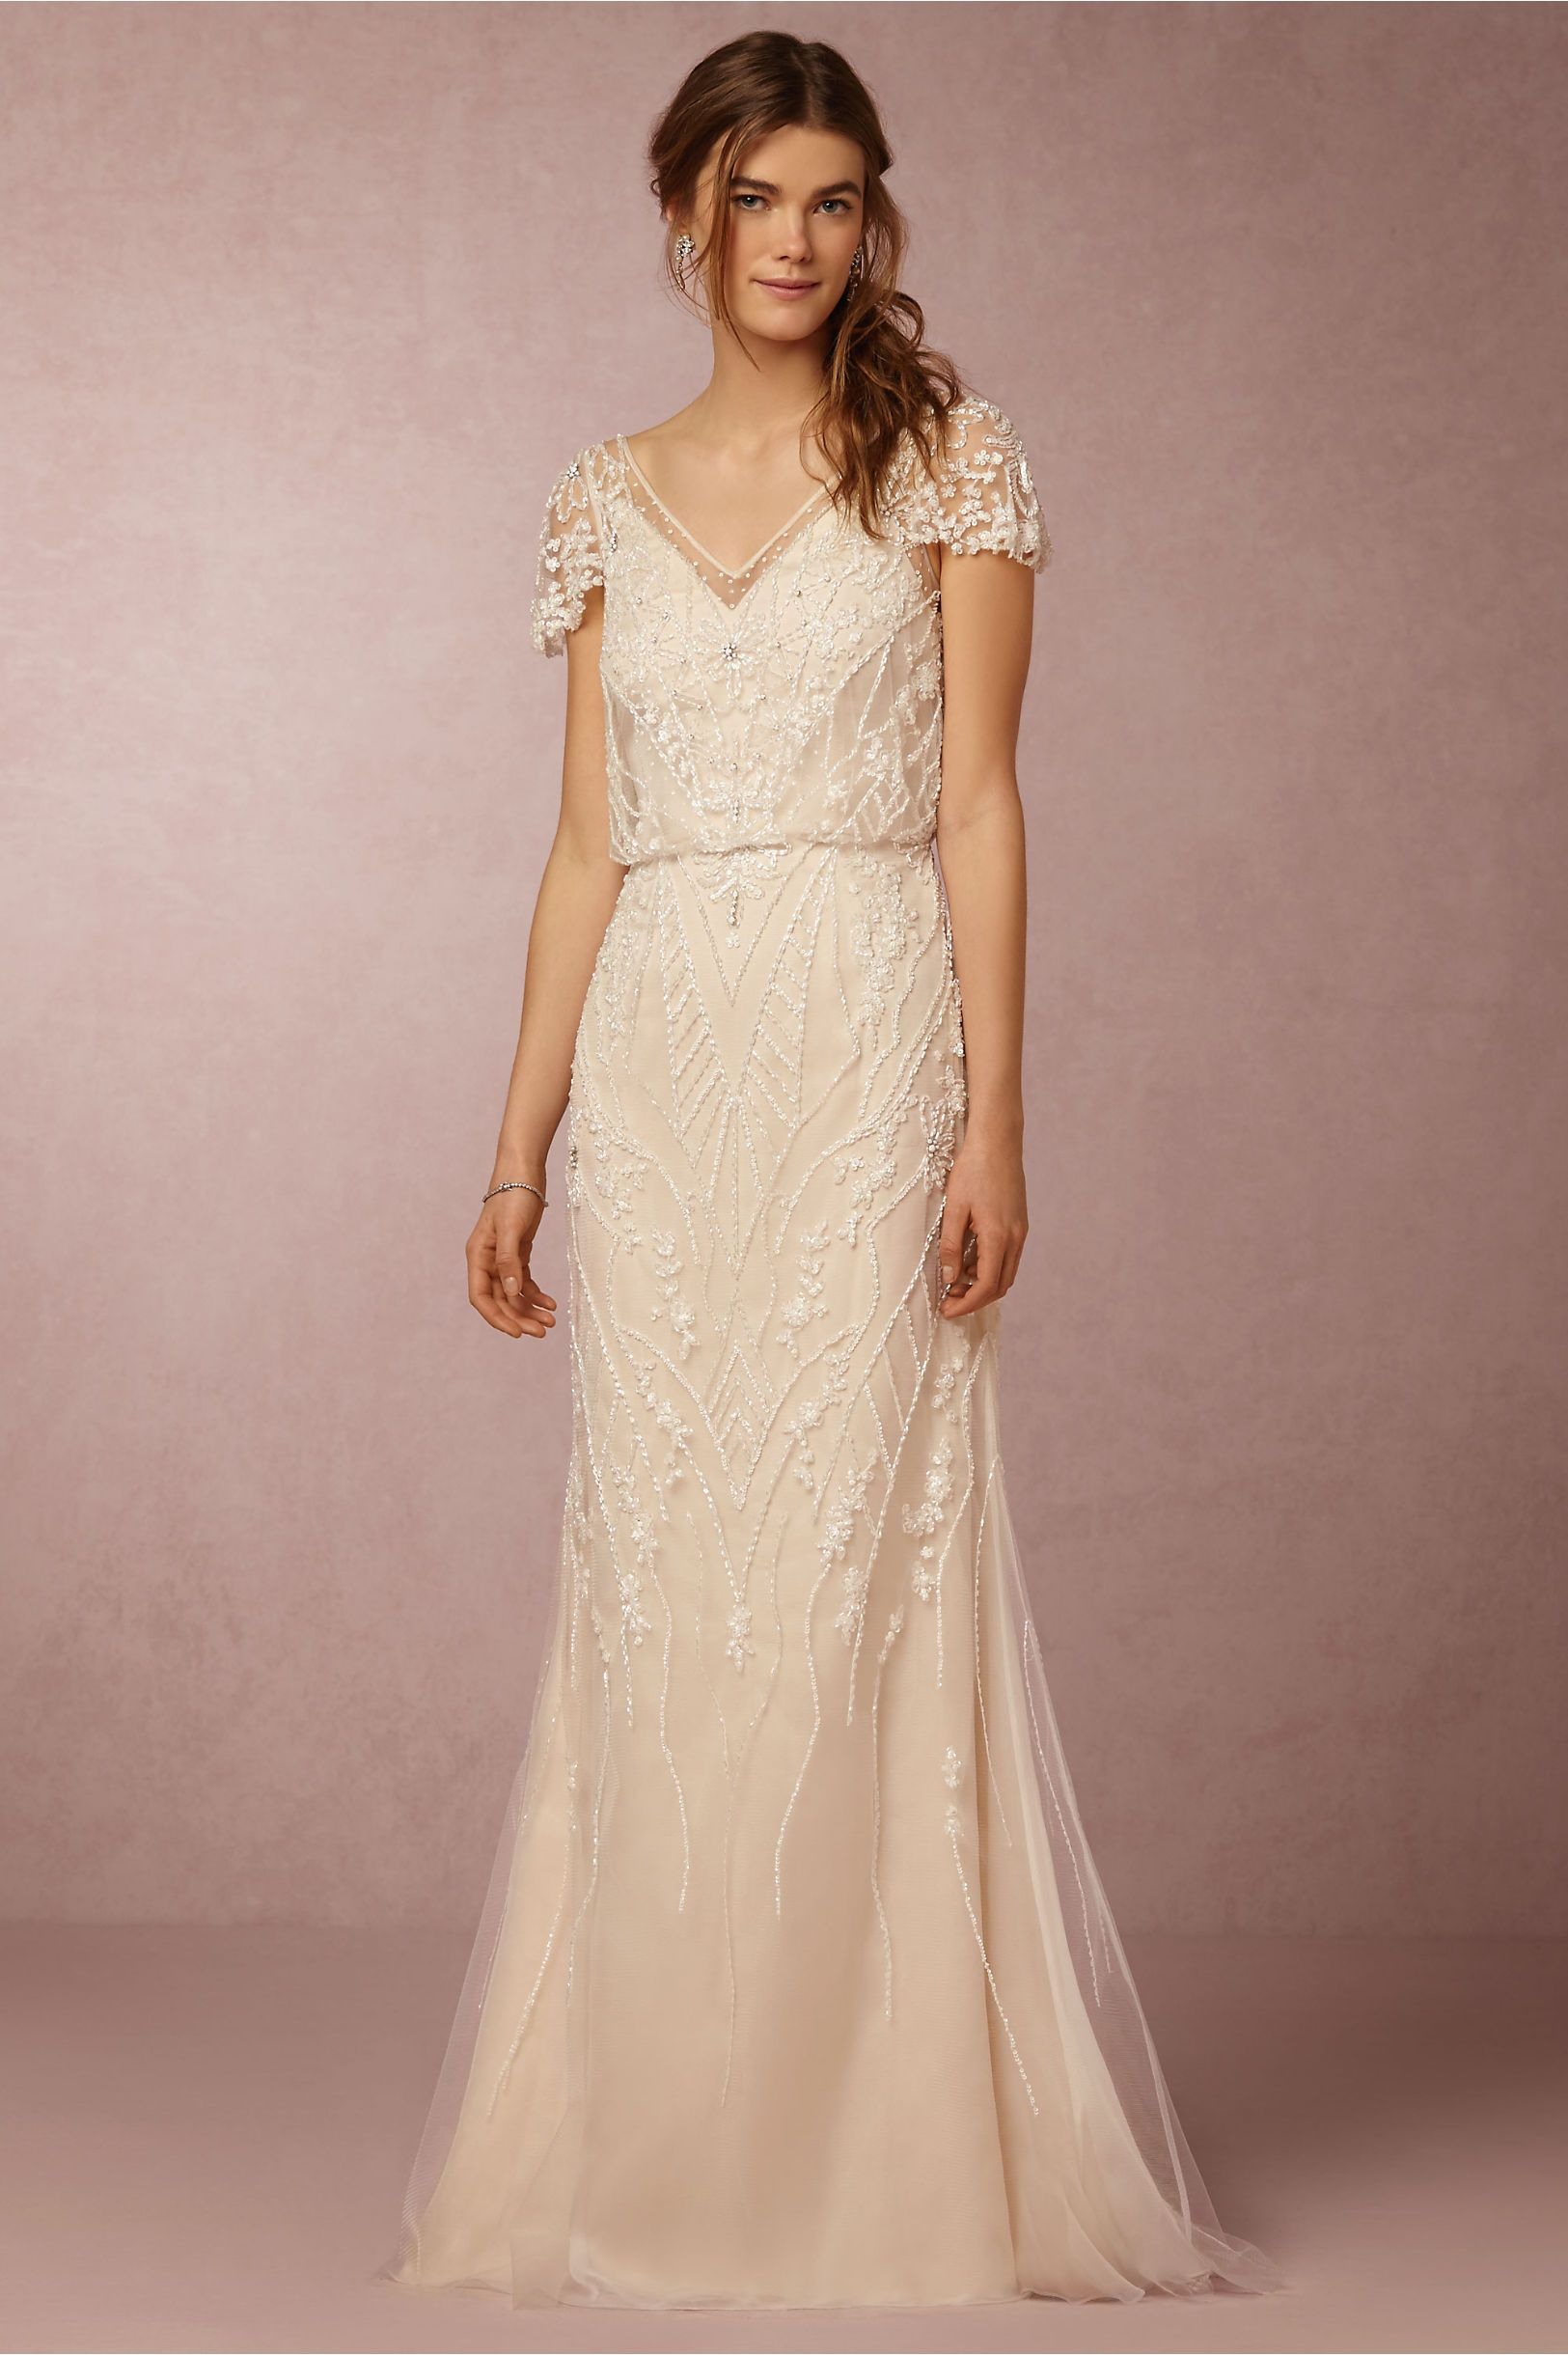 short sleeve wedding dresses BHLDN Aurora Gown in Bride Wedding Dresses at BHLDN mostly added b c I think it would look nice on Caitlin